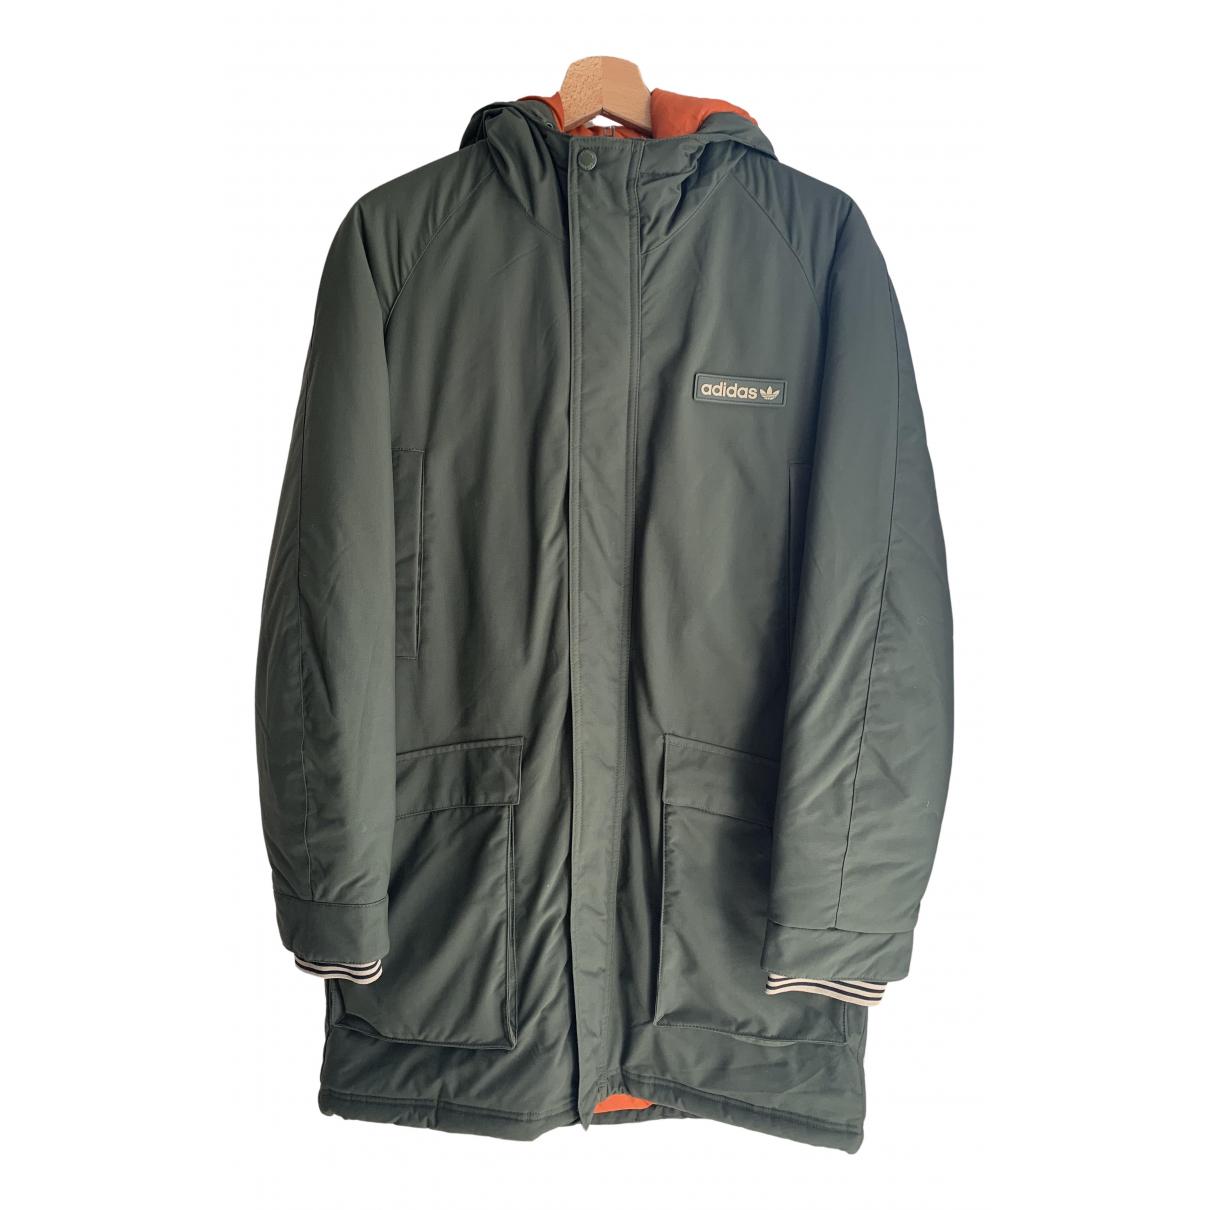 Adidas \N Green coat for Women M International